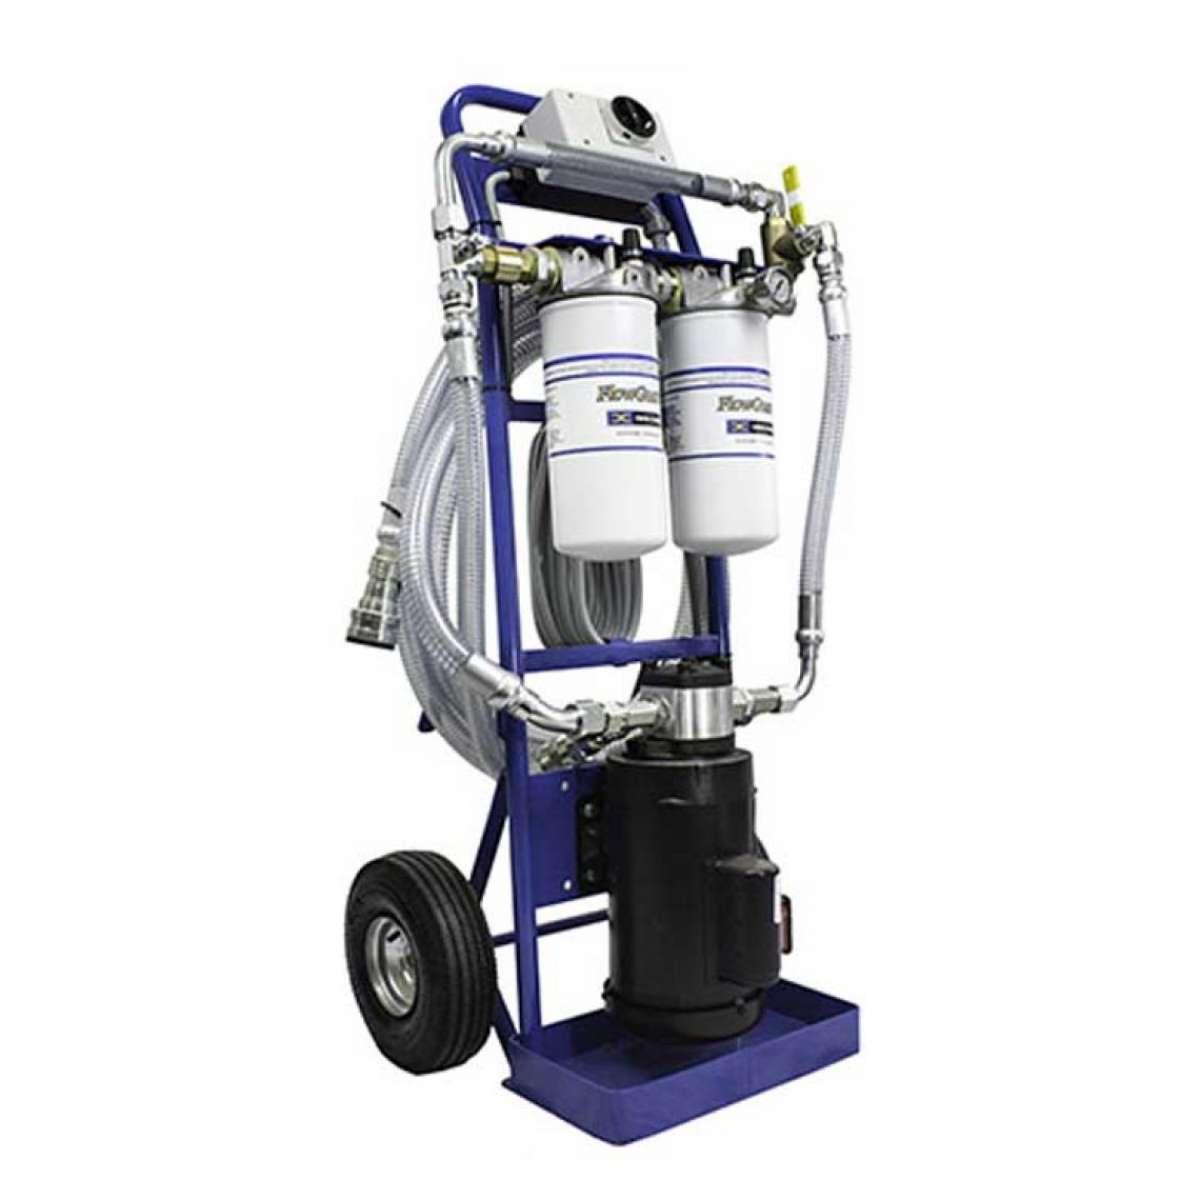 FlowGuard Filter Cart - 5 gpm pump 1 hp electric motor 115 vac 60 hz, 1725 rpms,13 amps